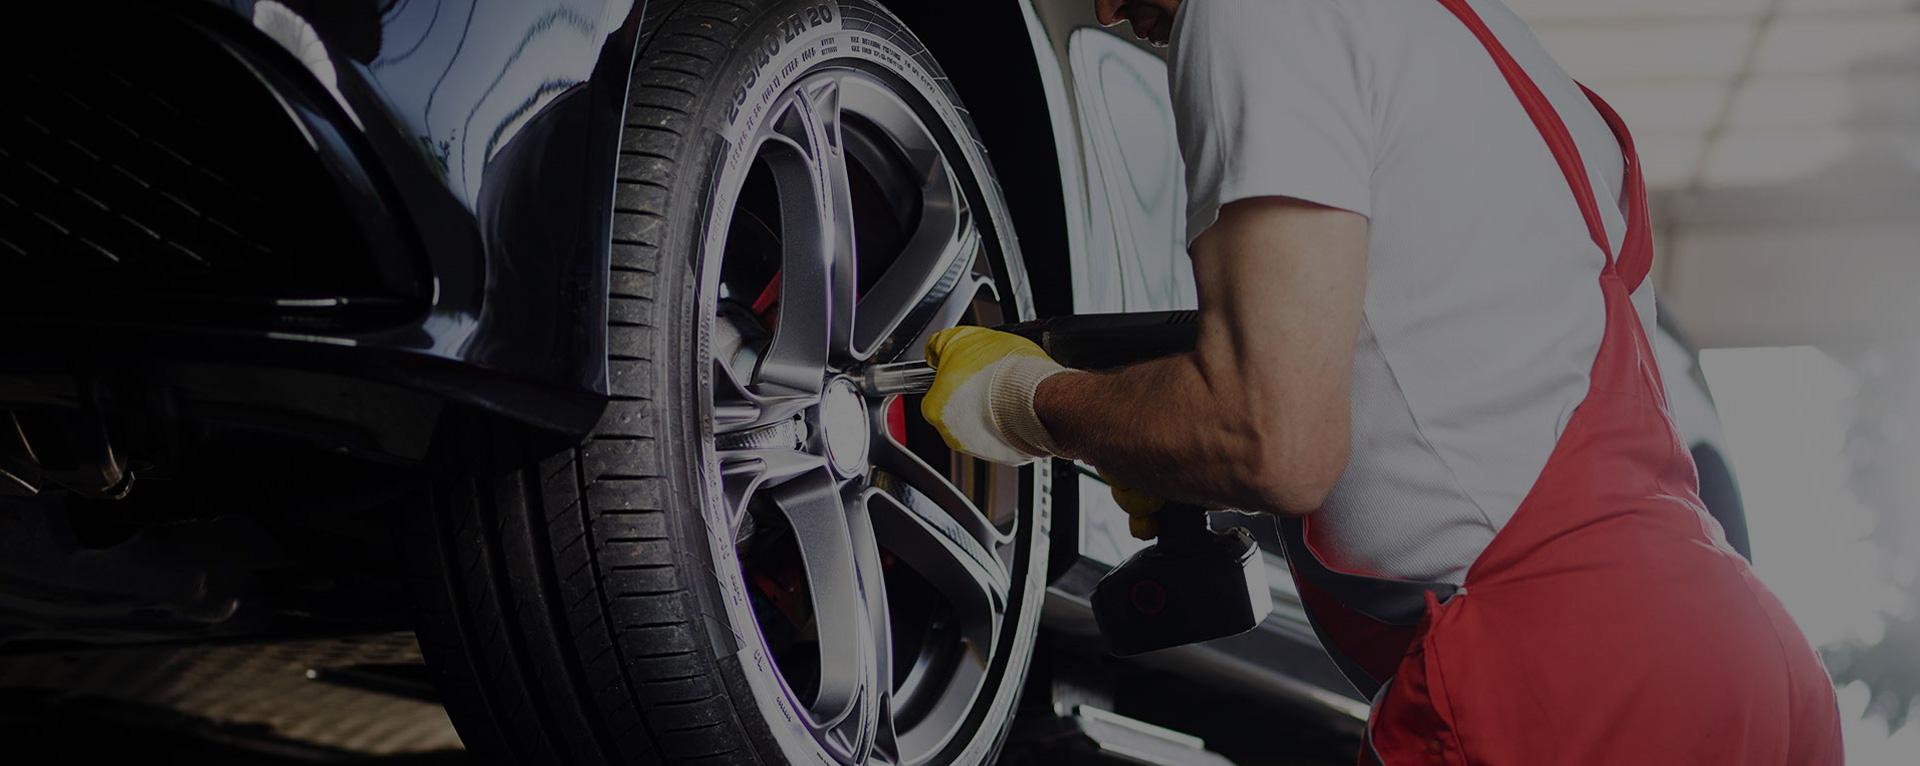 Mechanic Fitting Tyre